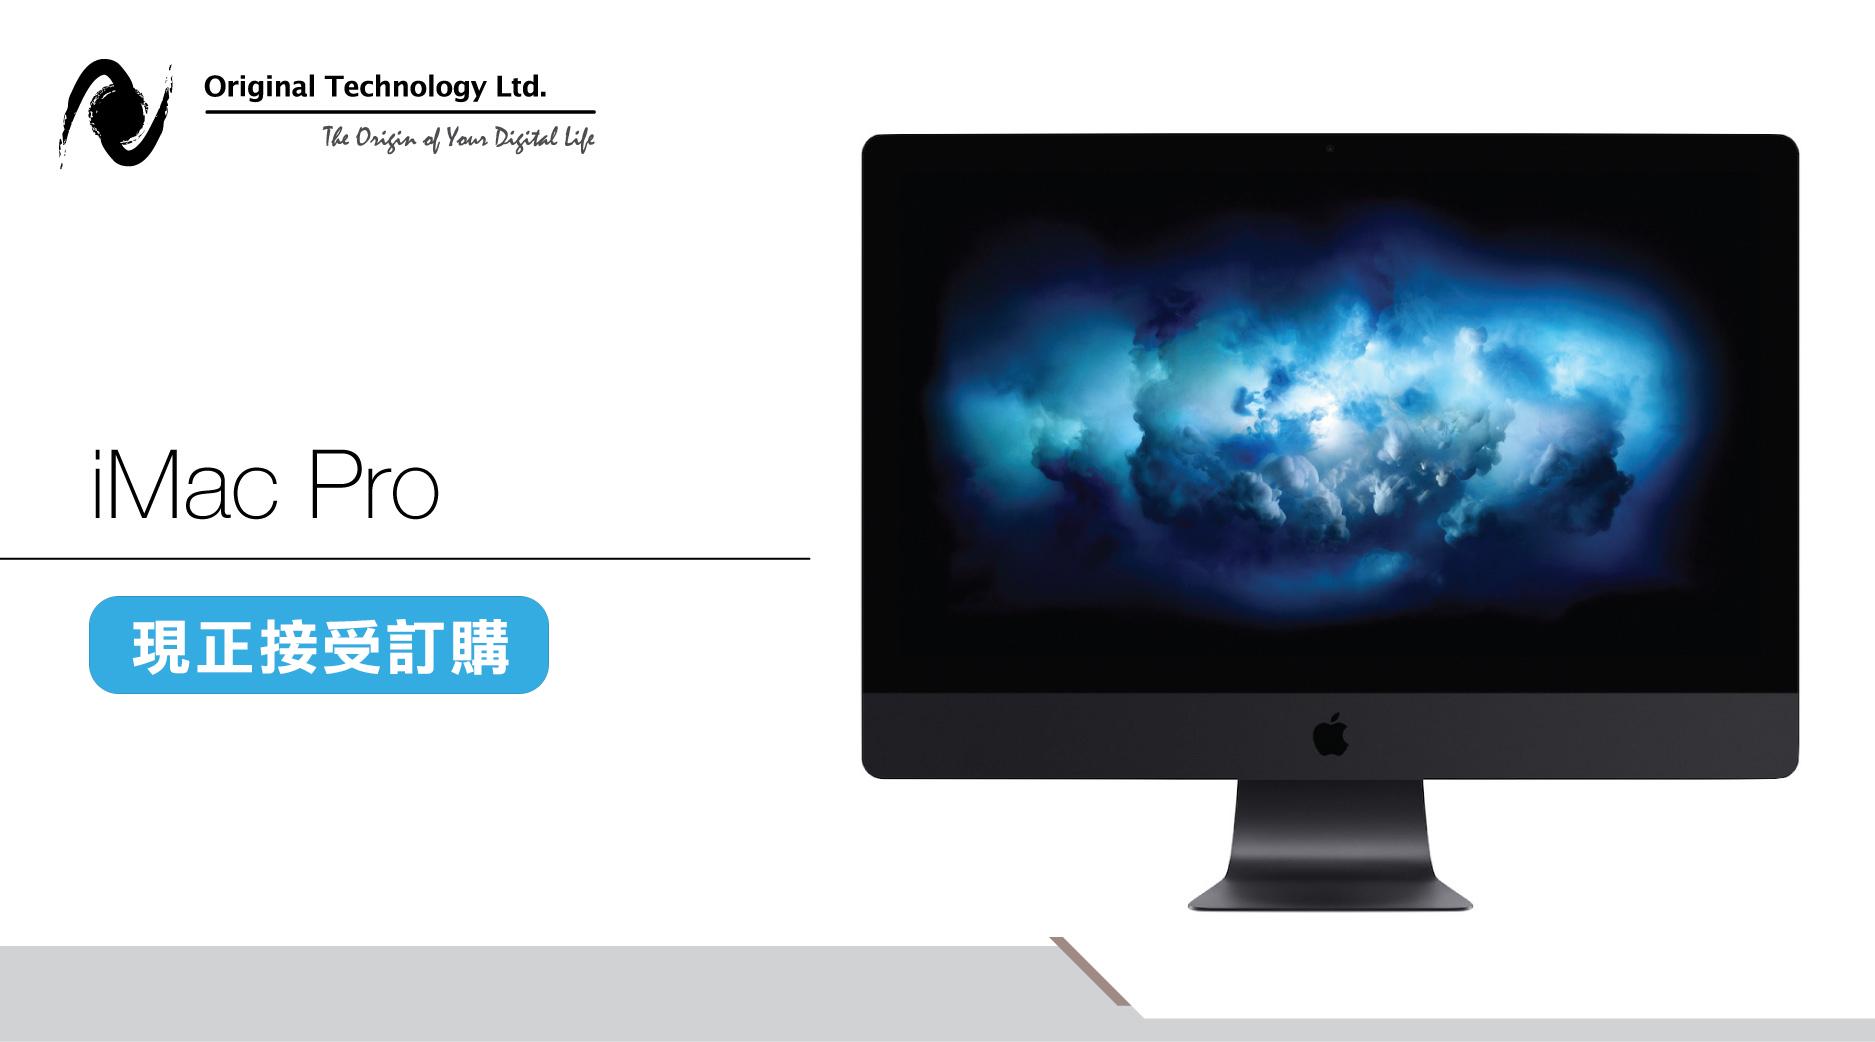 NA04_iMac_Pro-PreOrder_900x500_01-01.jpg